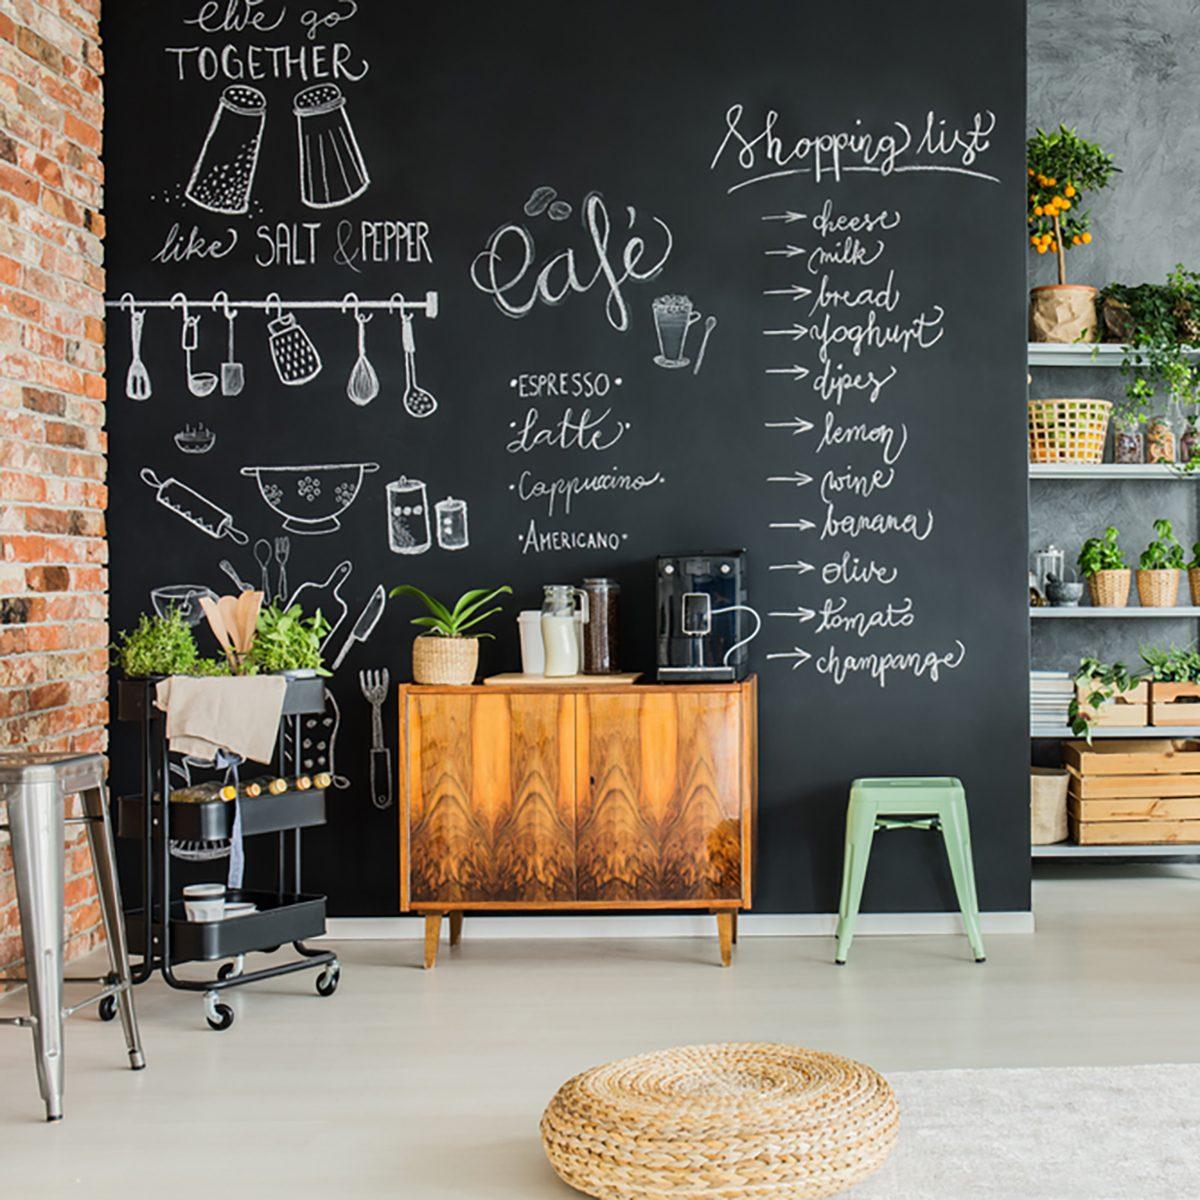 12 Kitchen Design Ideas that Make Cooking Easier | Taste of Home